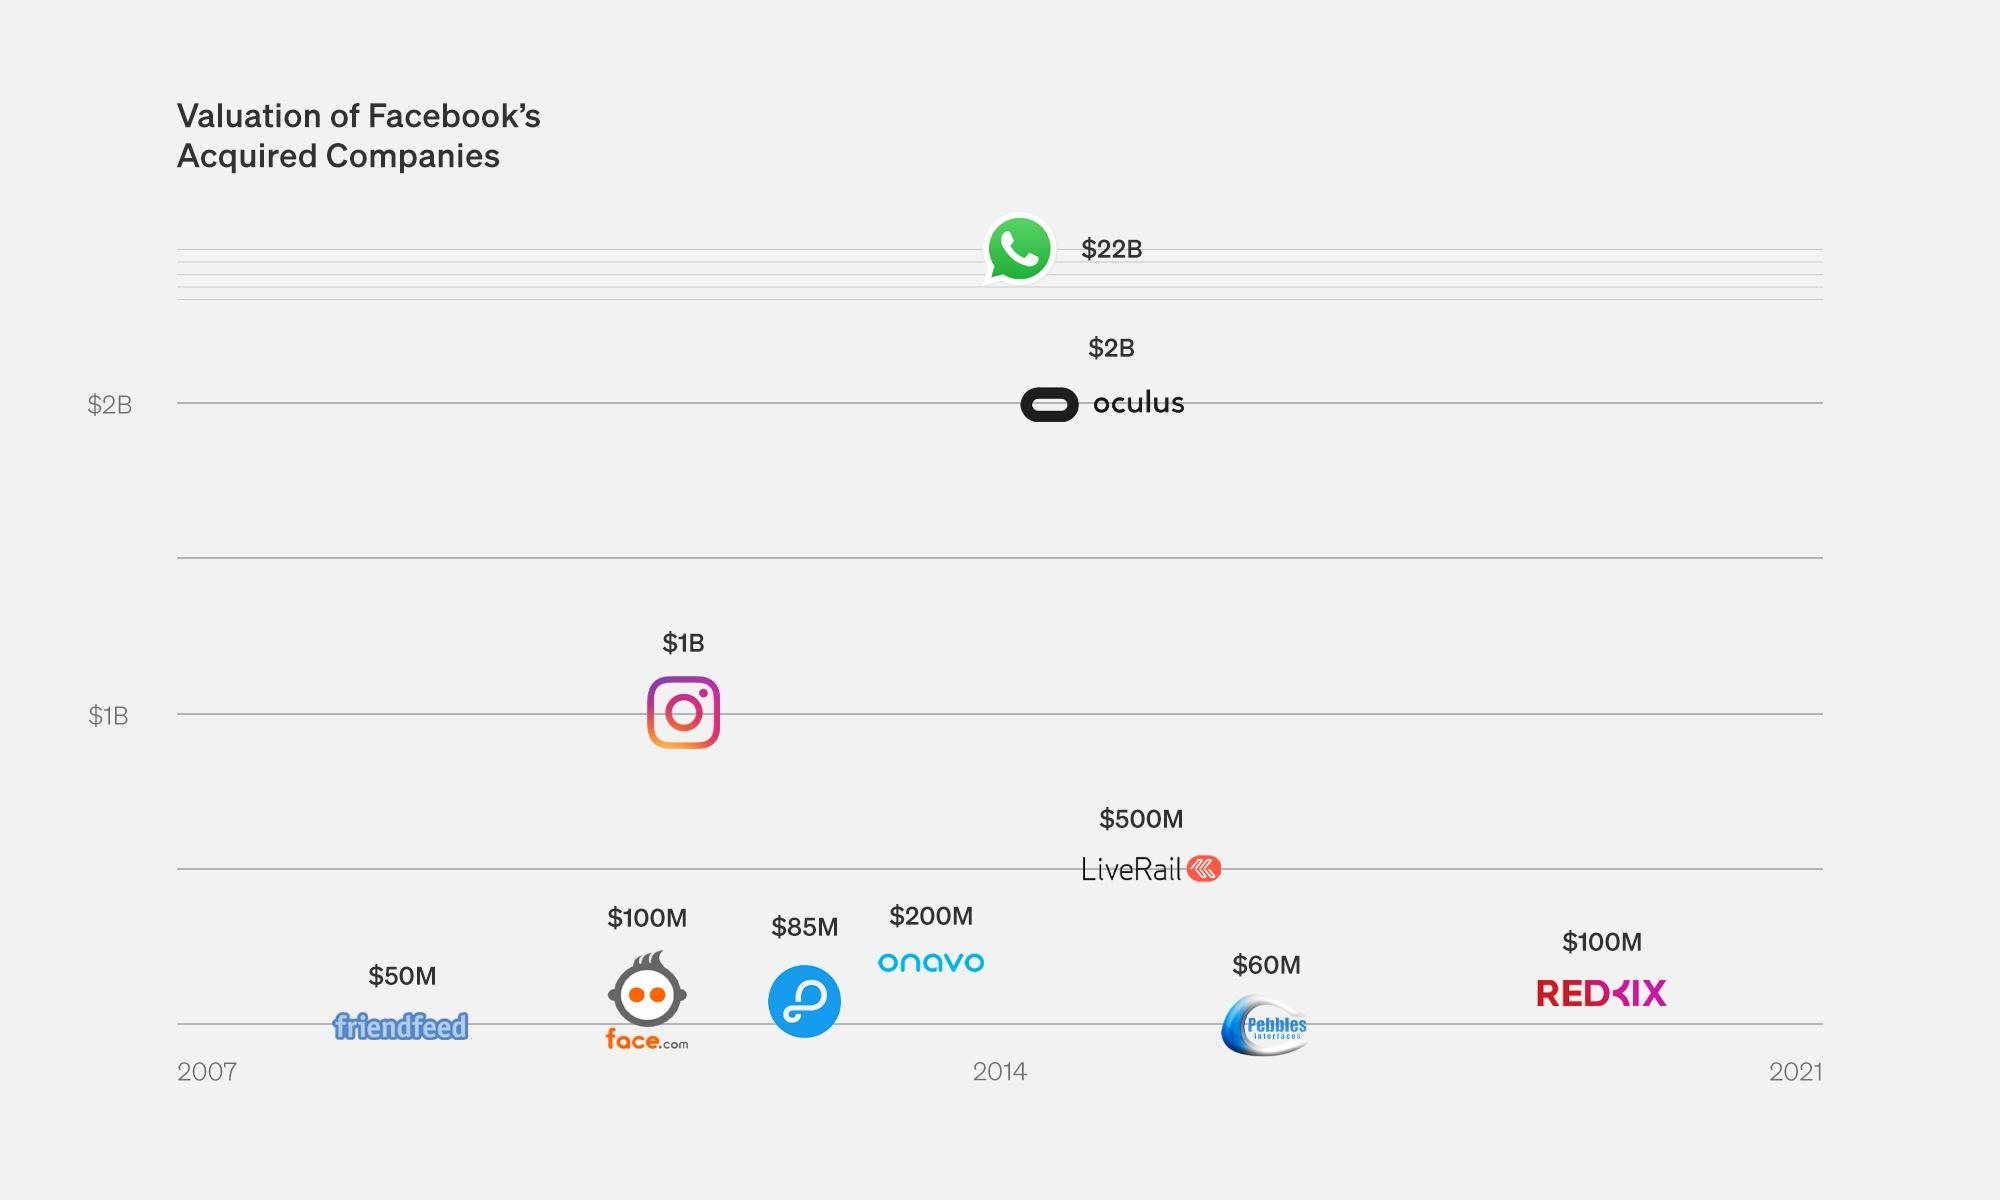 Facebook's major acquisitions